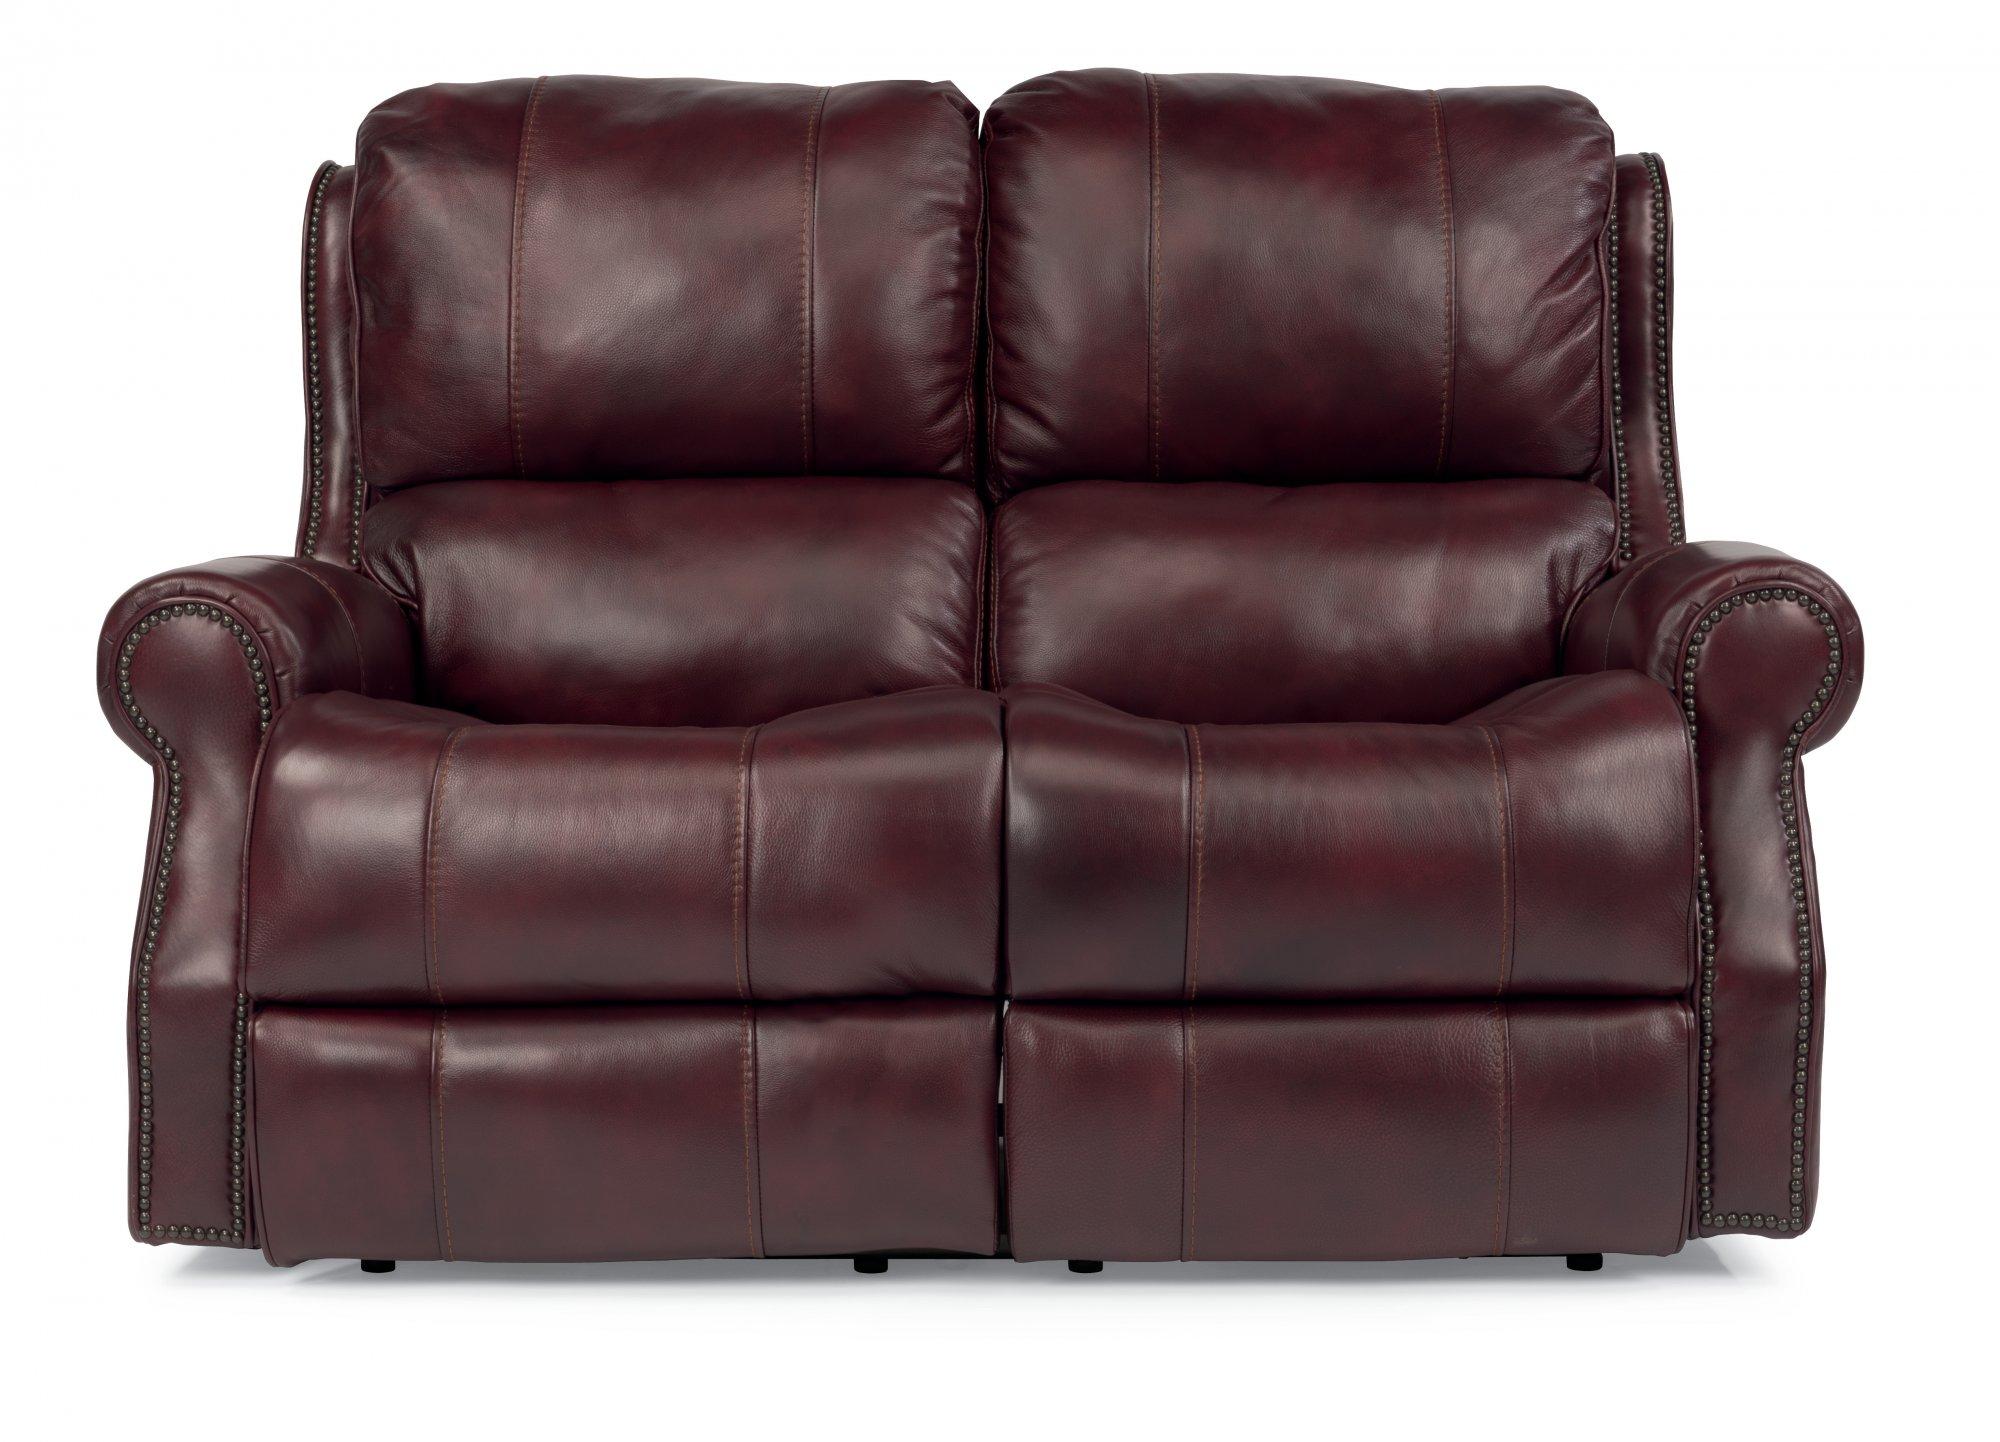 reclining and leather loveseat flexsteel on com sofa aifaresidency furniture imposing